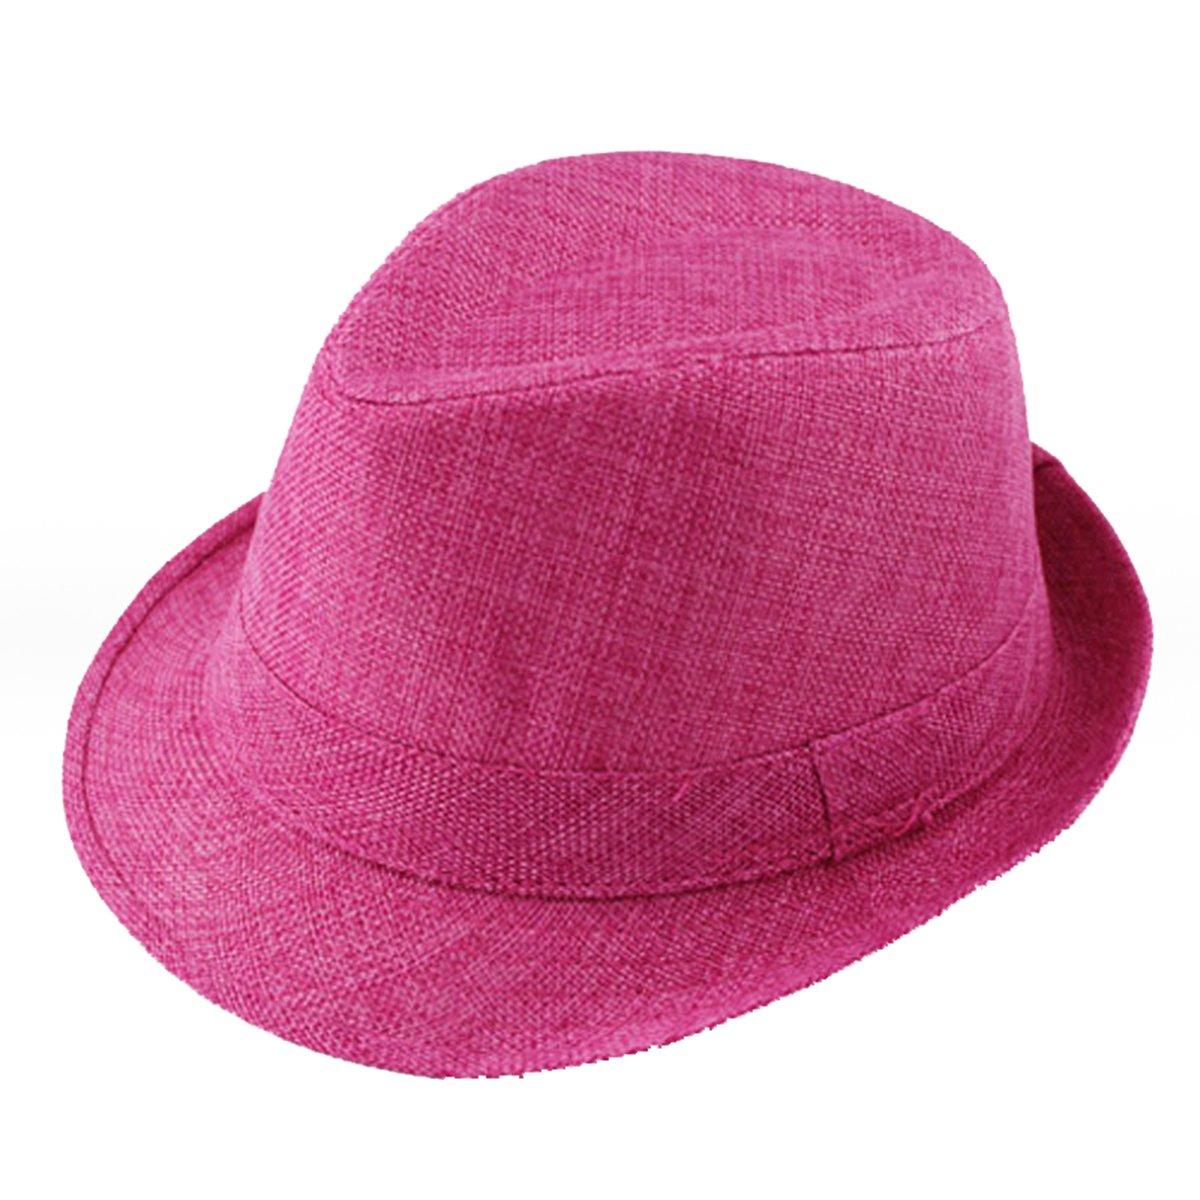 Baby Linen Fedora Hat Infant Toddler Jazz Cap Kids Straw Sun Cowboy Hat Pink TM